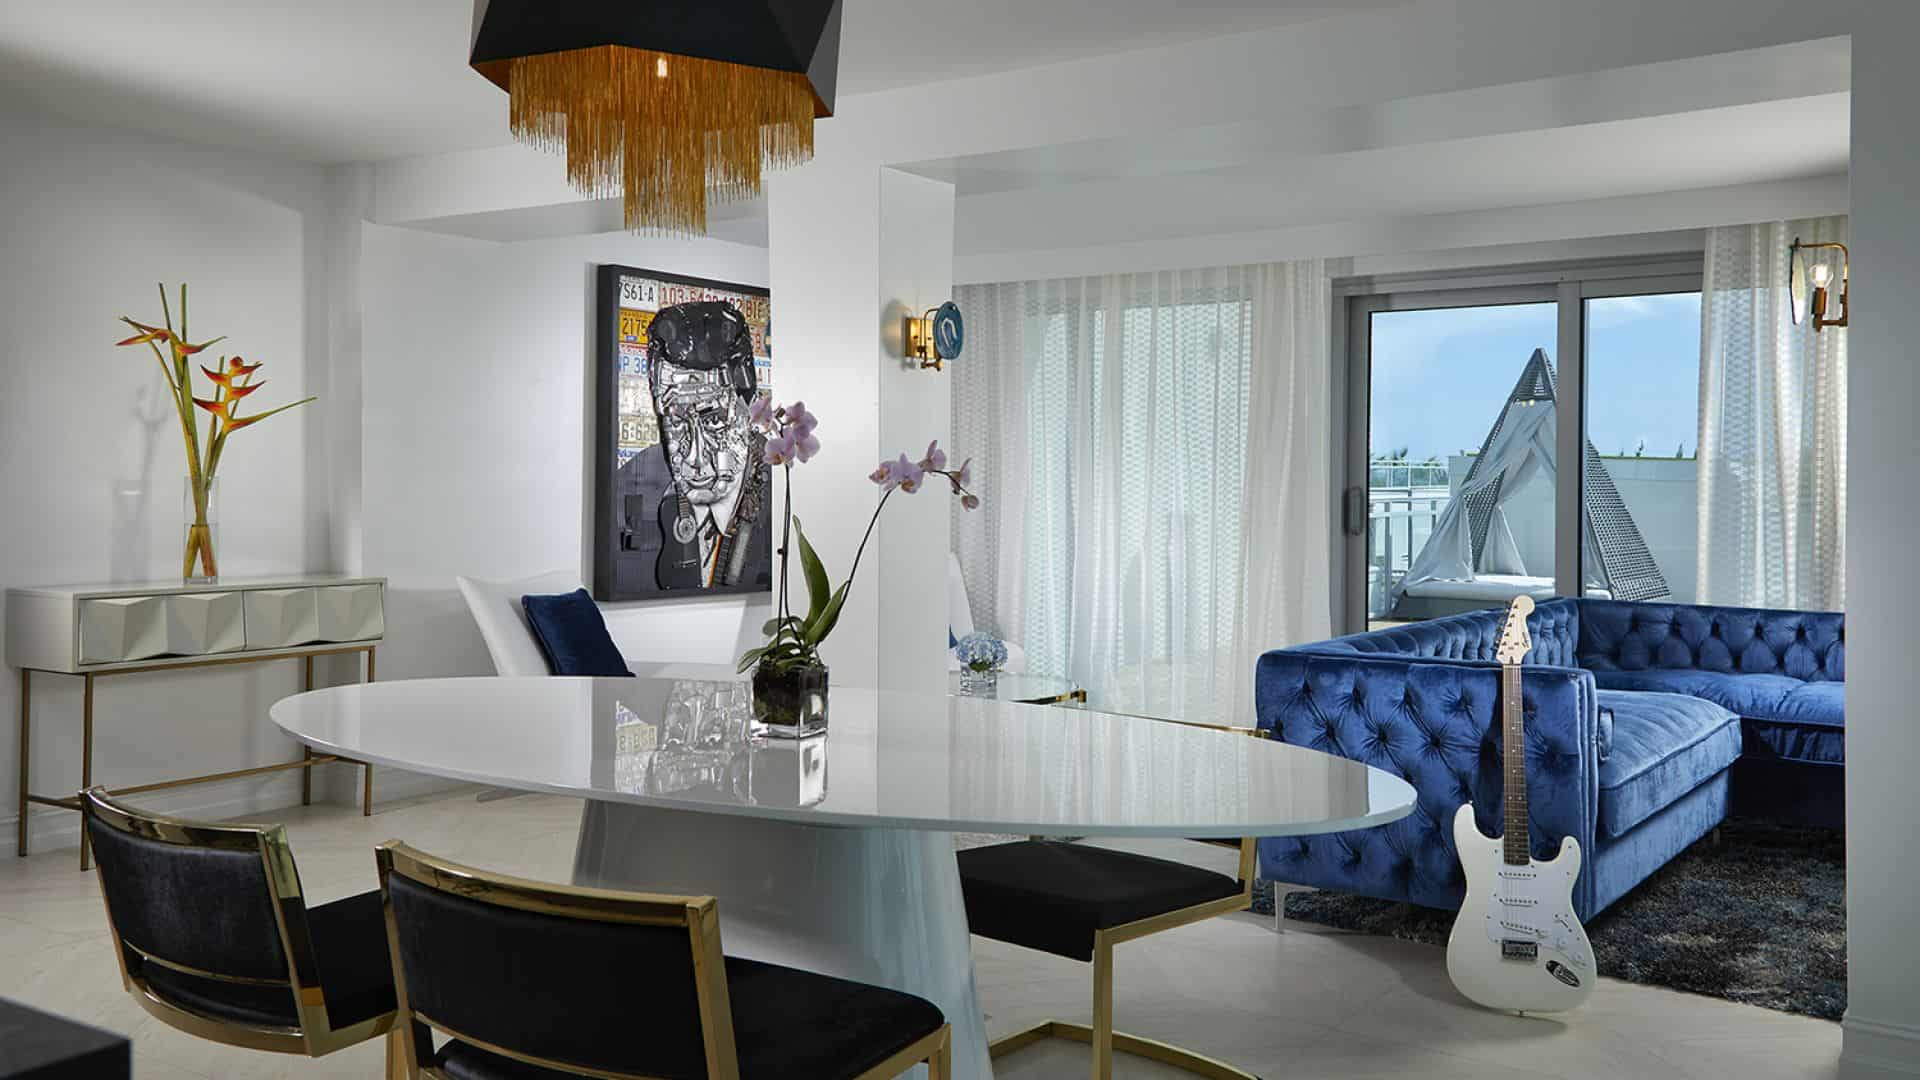 image of Hard Rock Hotel Daytona Beach